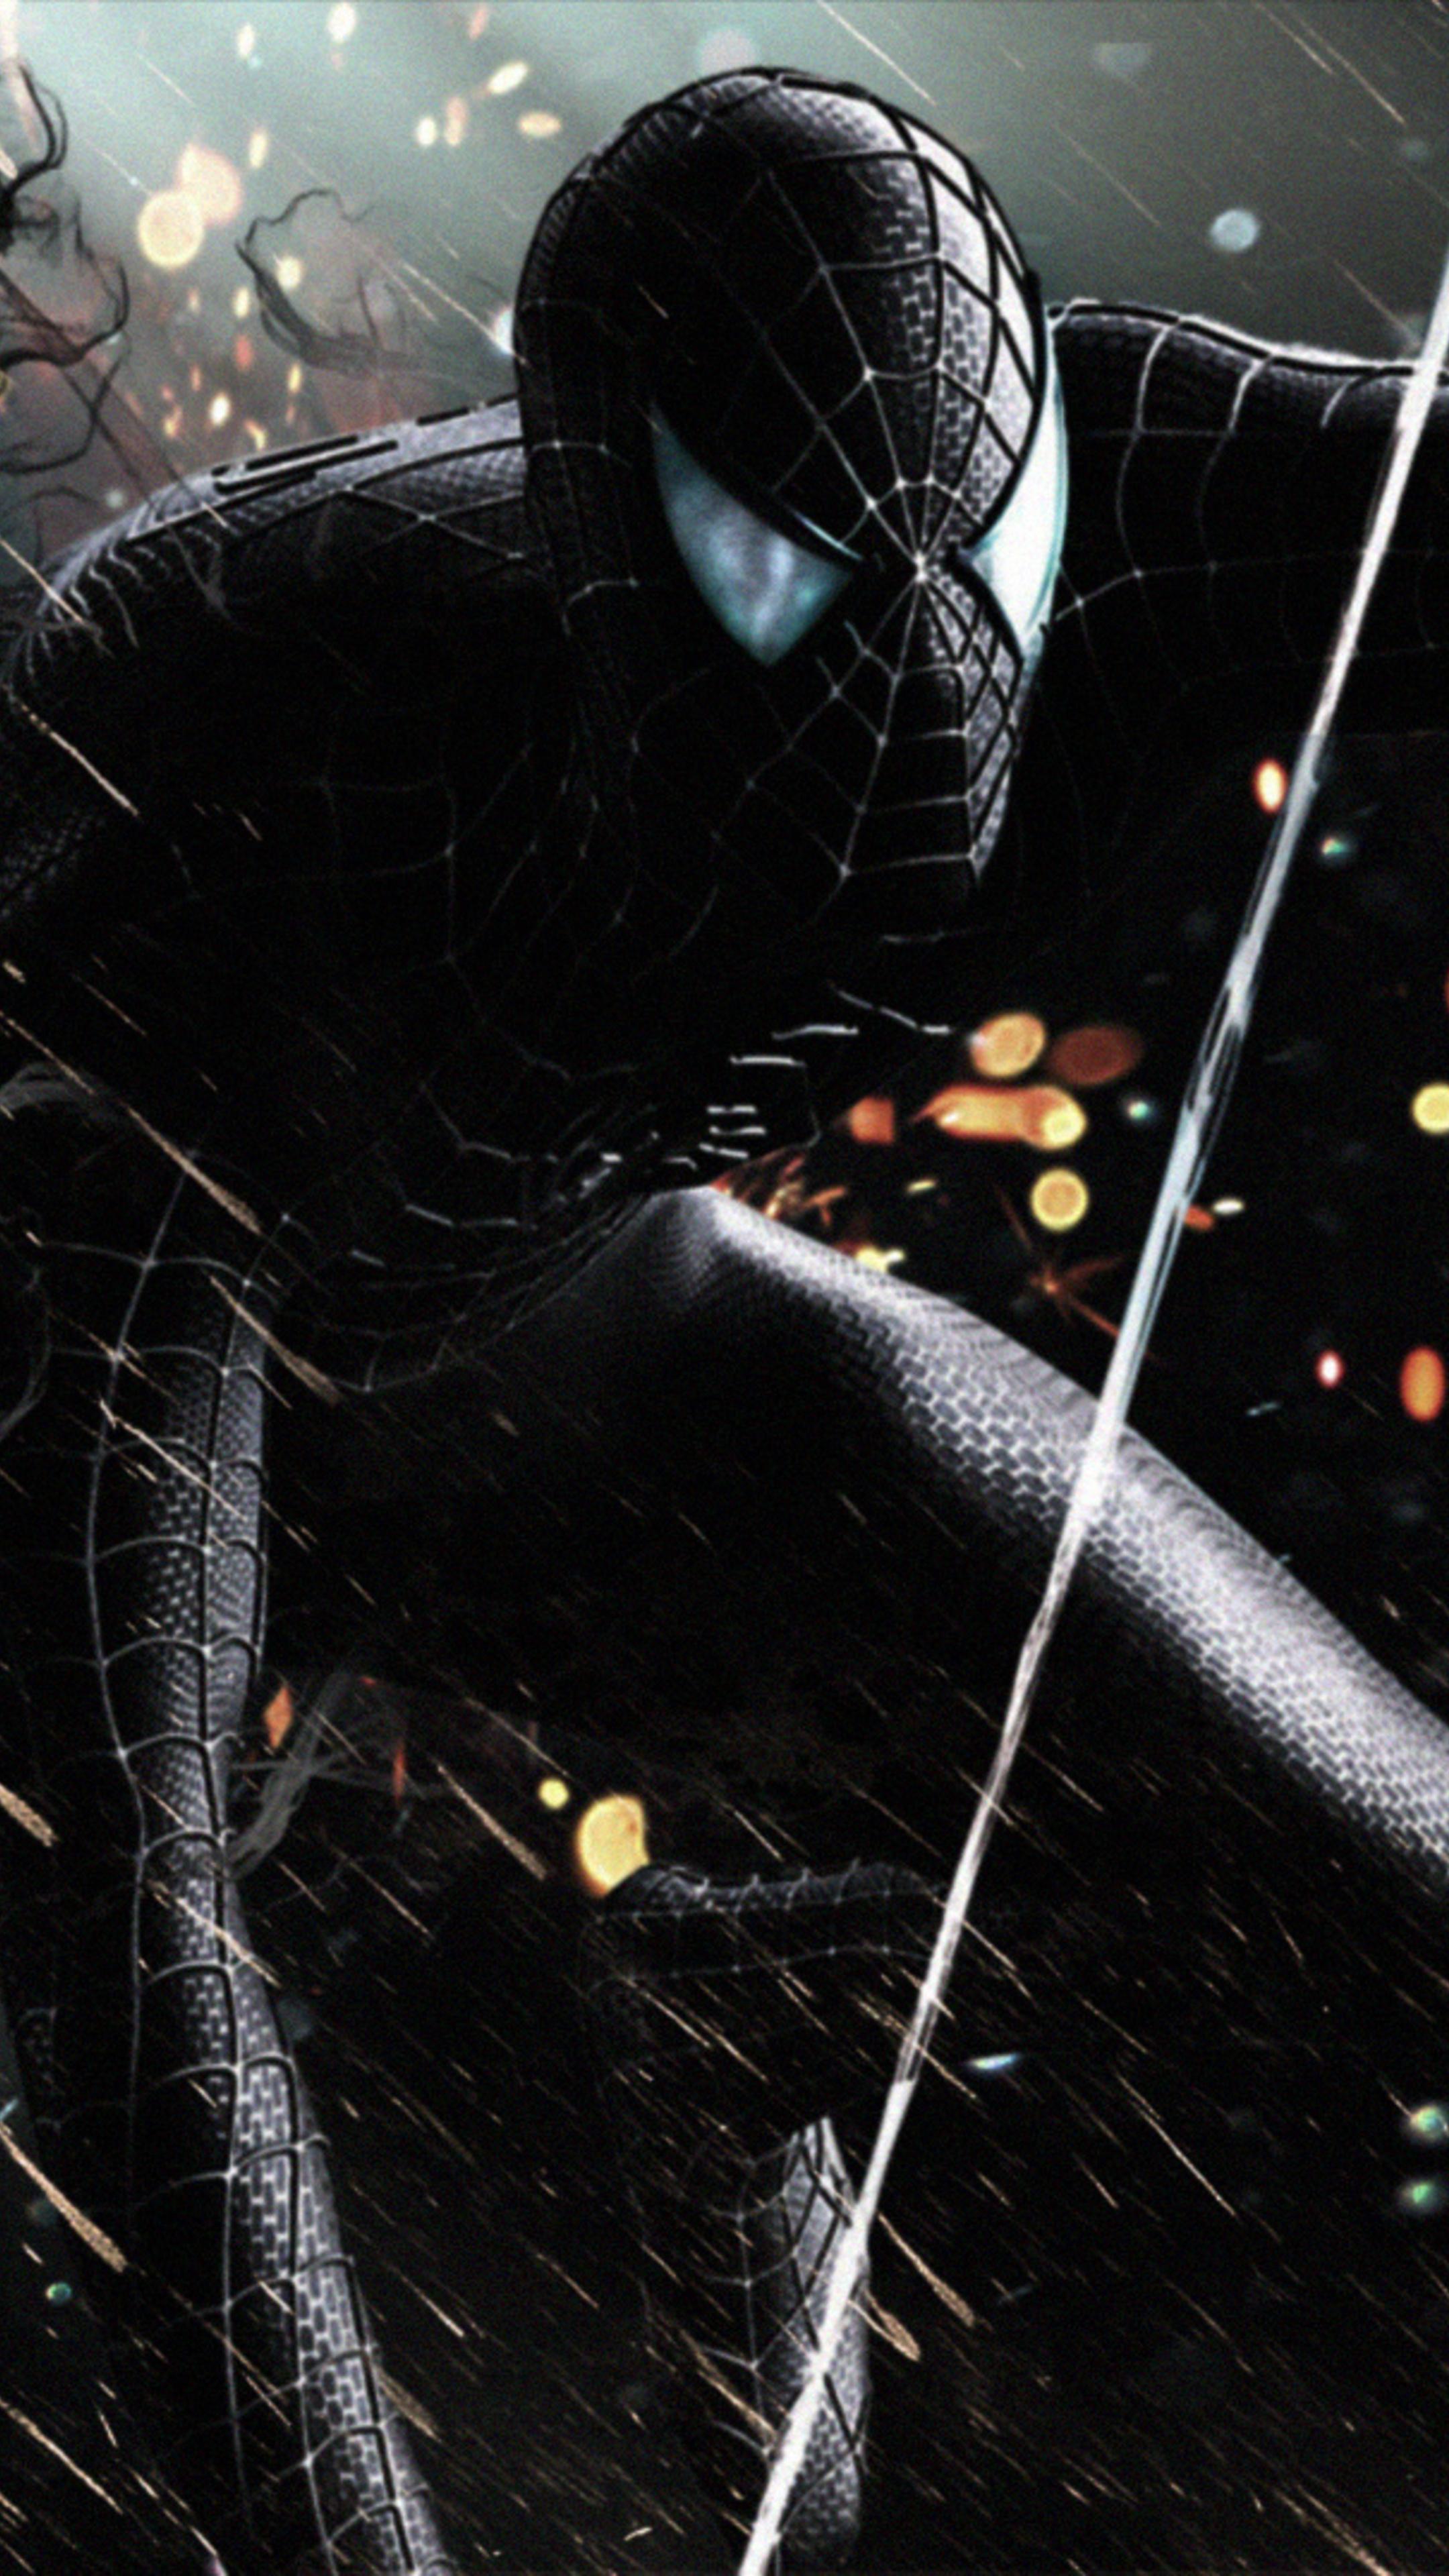 2160x3840 black spiderman sony xperia x xz z5 premium hd - Art wallpaper 2160x3840 ...